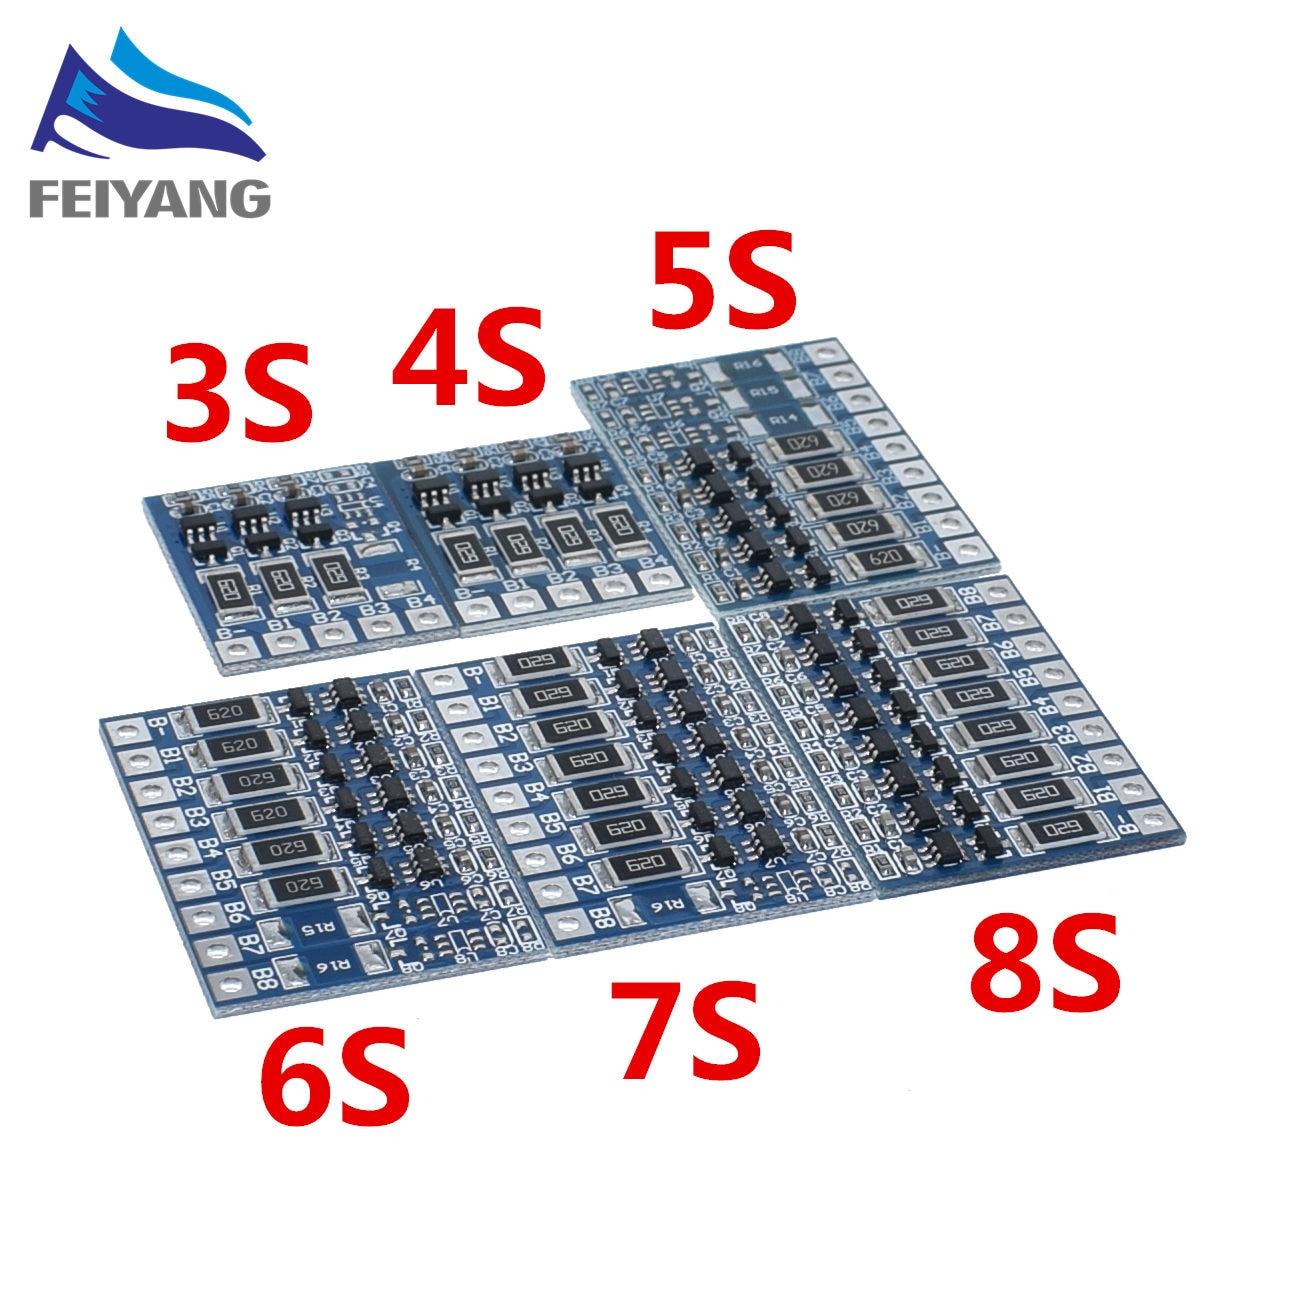 5S 21V 4.2V Balance Function Protection Board 68mA 5S Li-ion Lipo Battery Lithium 18650 Batteries Balanced 3S 4S 5S 6S 7S 8S(China)